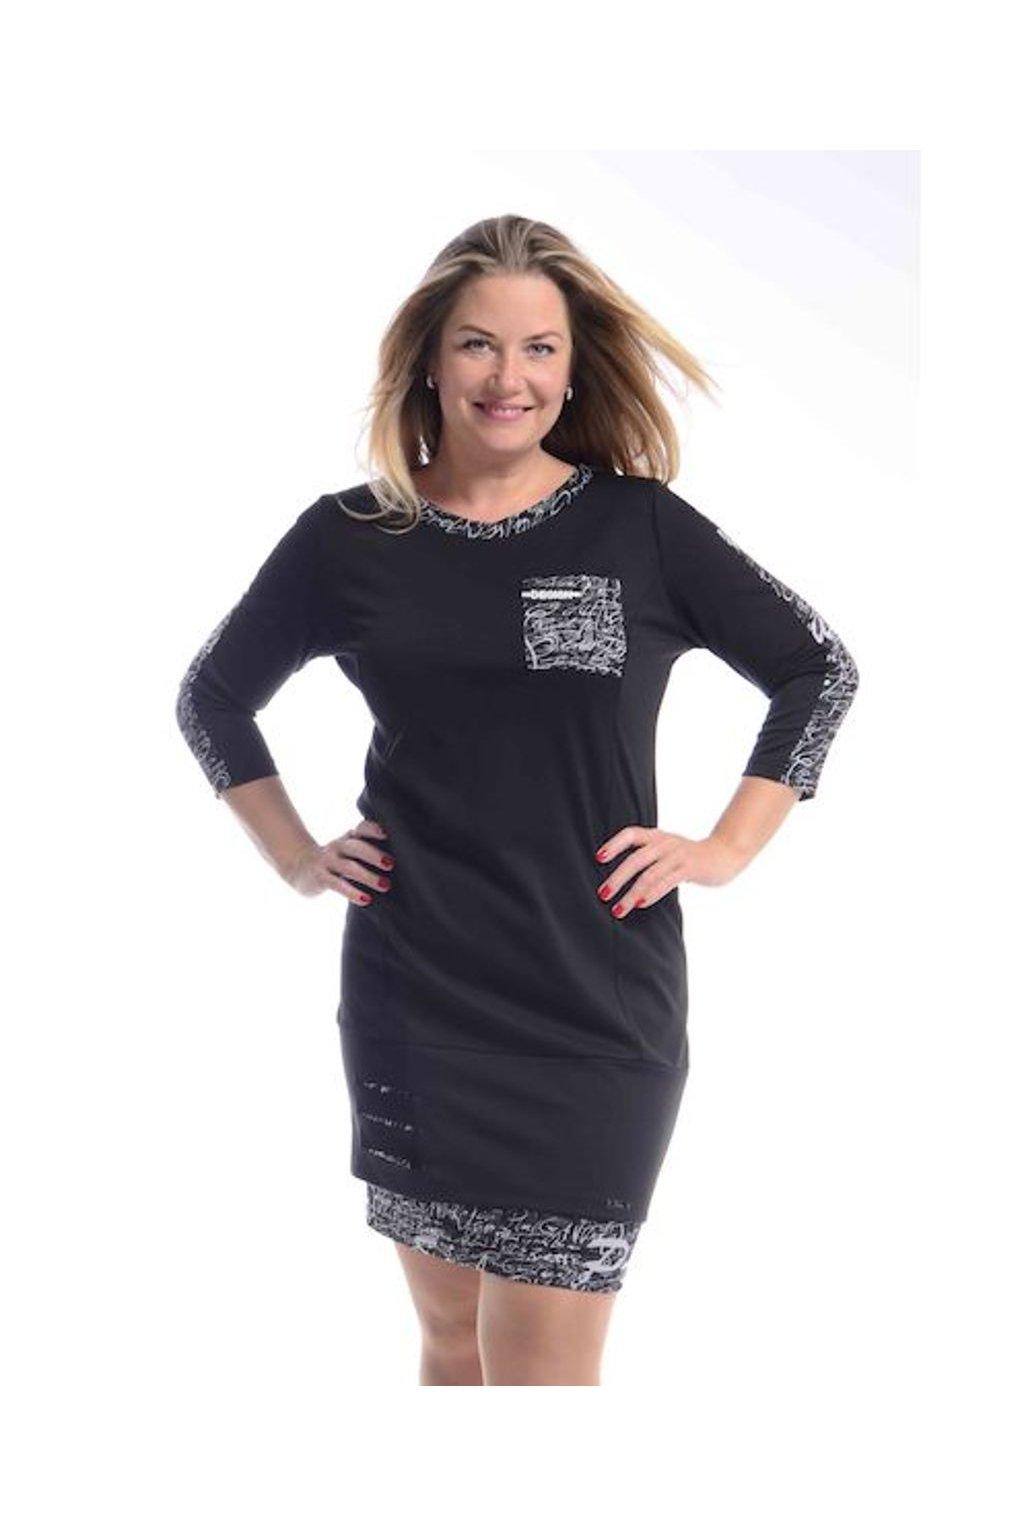 8620 Šaty Design (Velikost 36, Barva Černá)